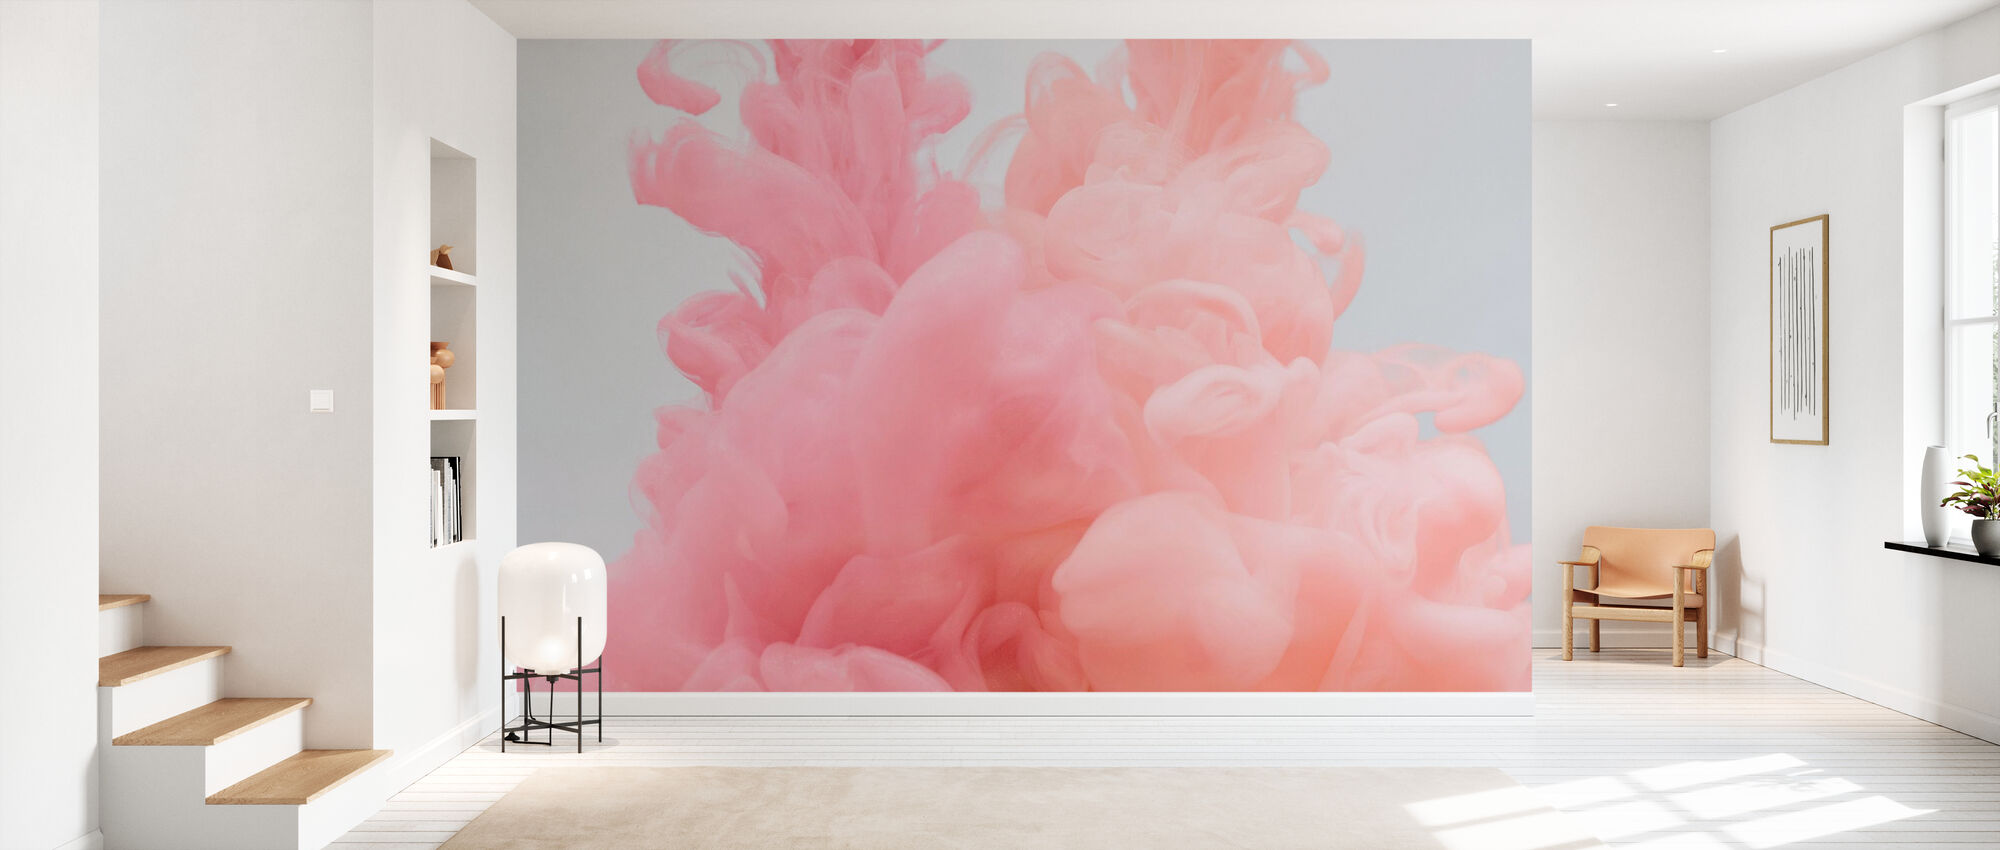 Peony Blossom - Wallpaper - Hallway